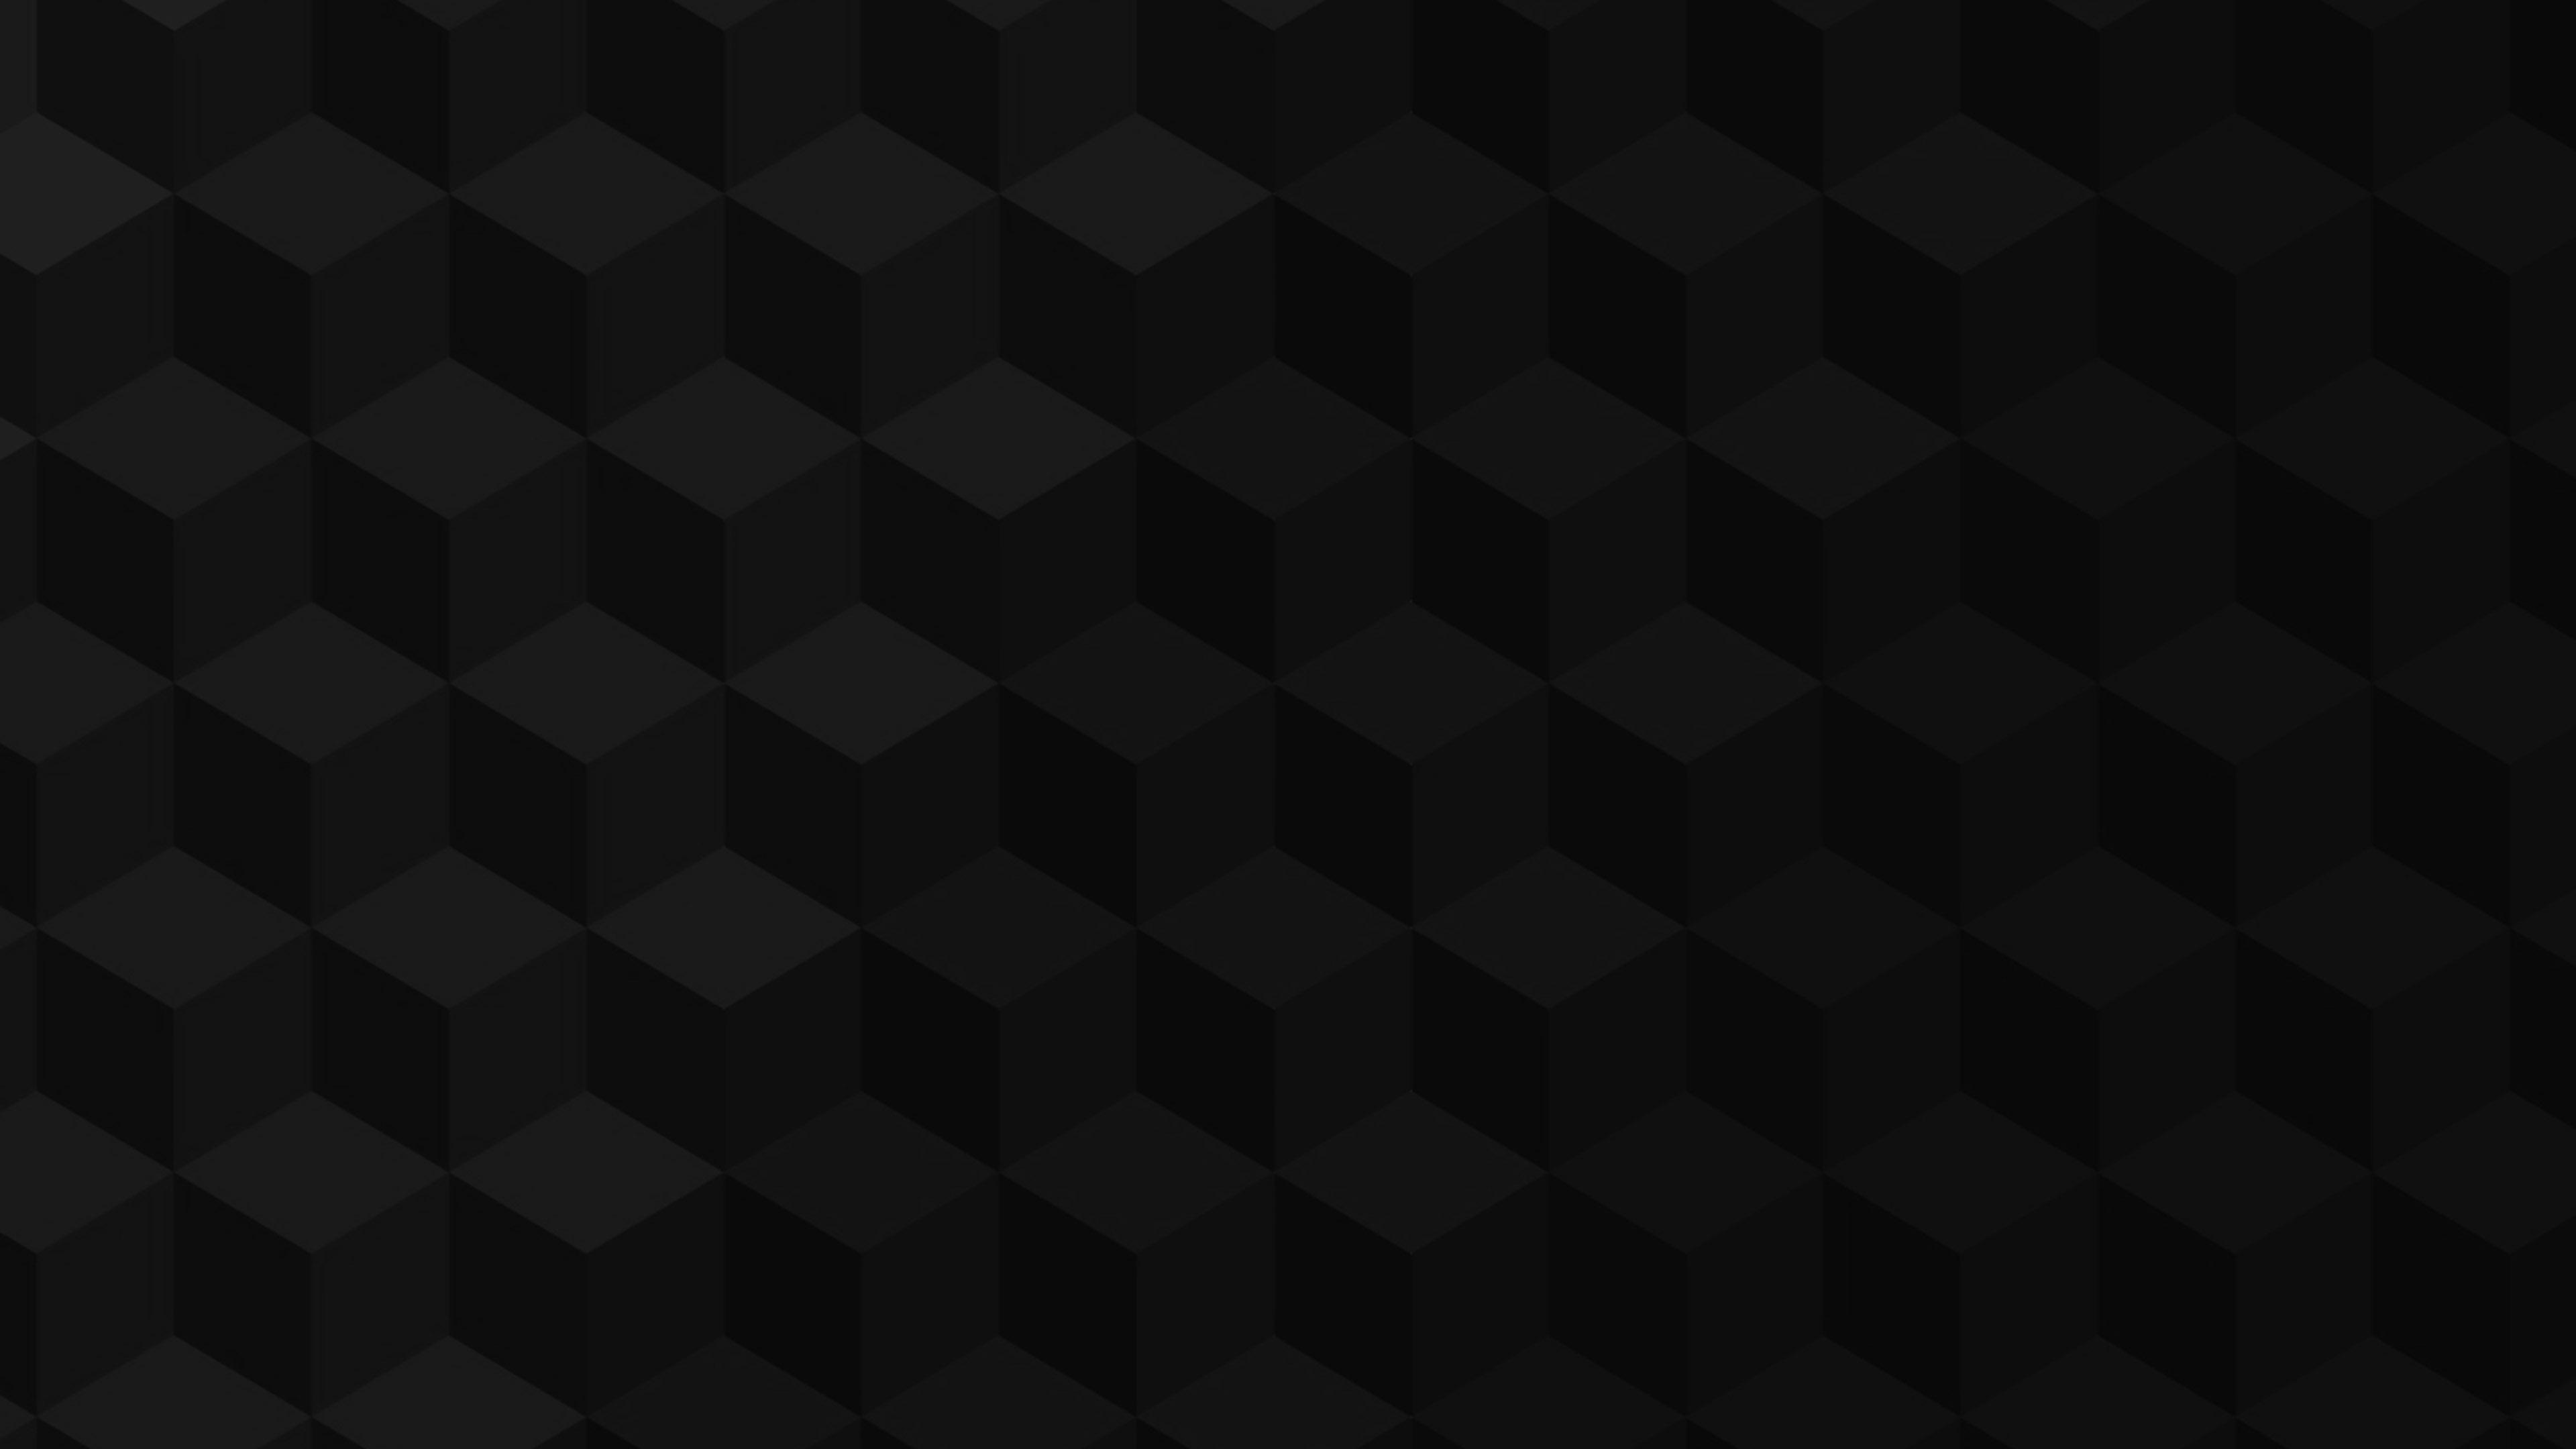 ve03-cube-shadow-dark-pattern-art - Papers.co